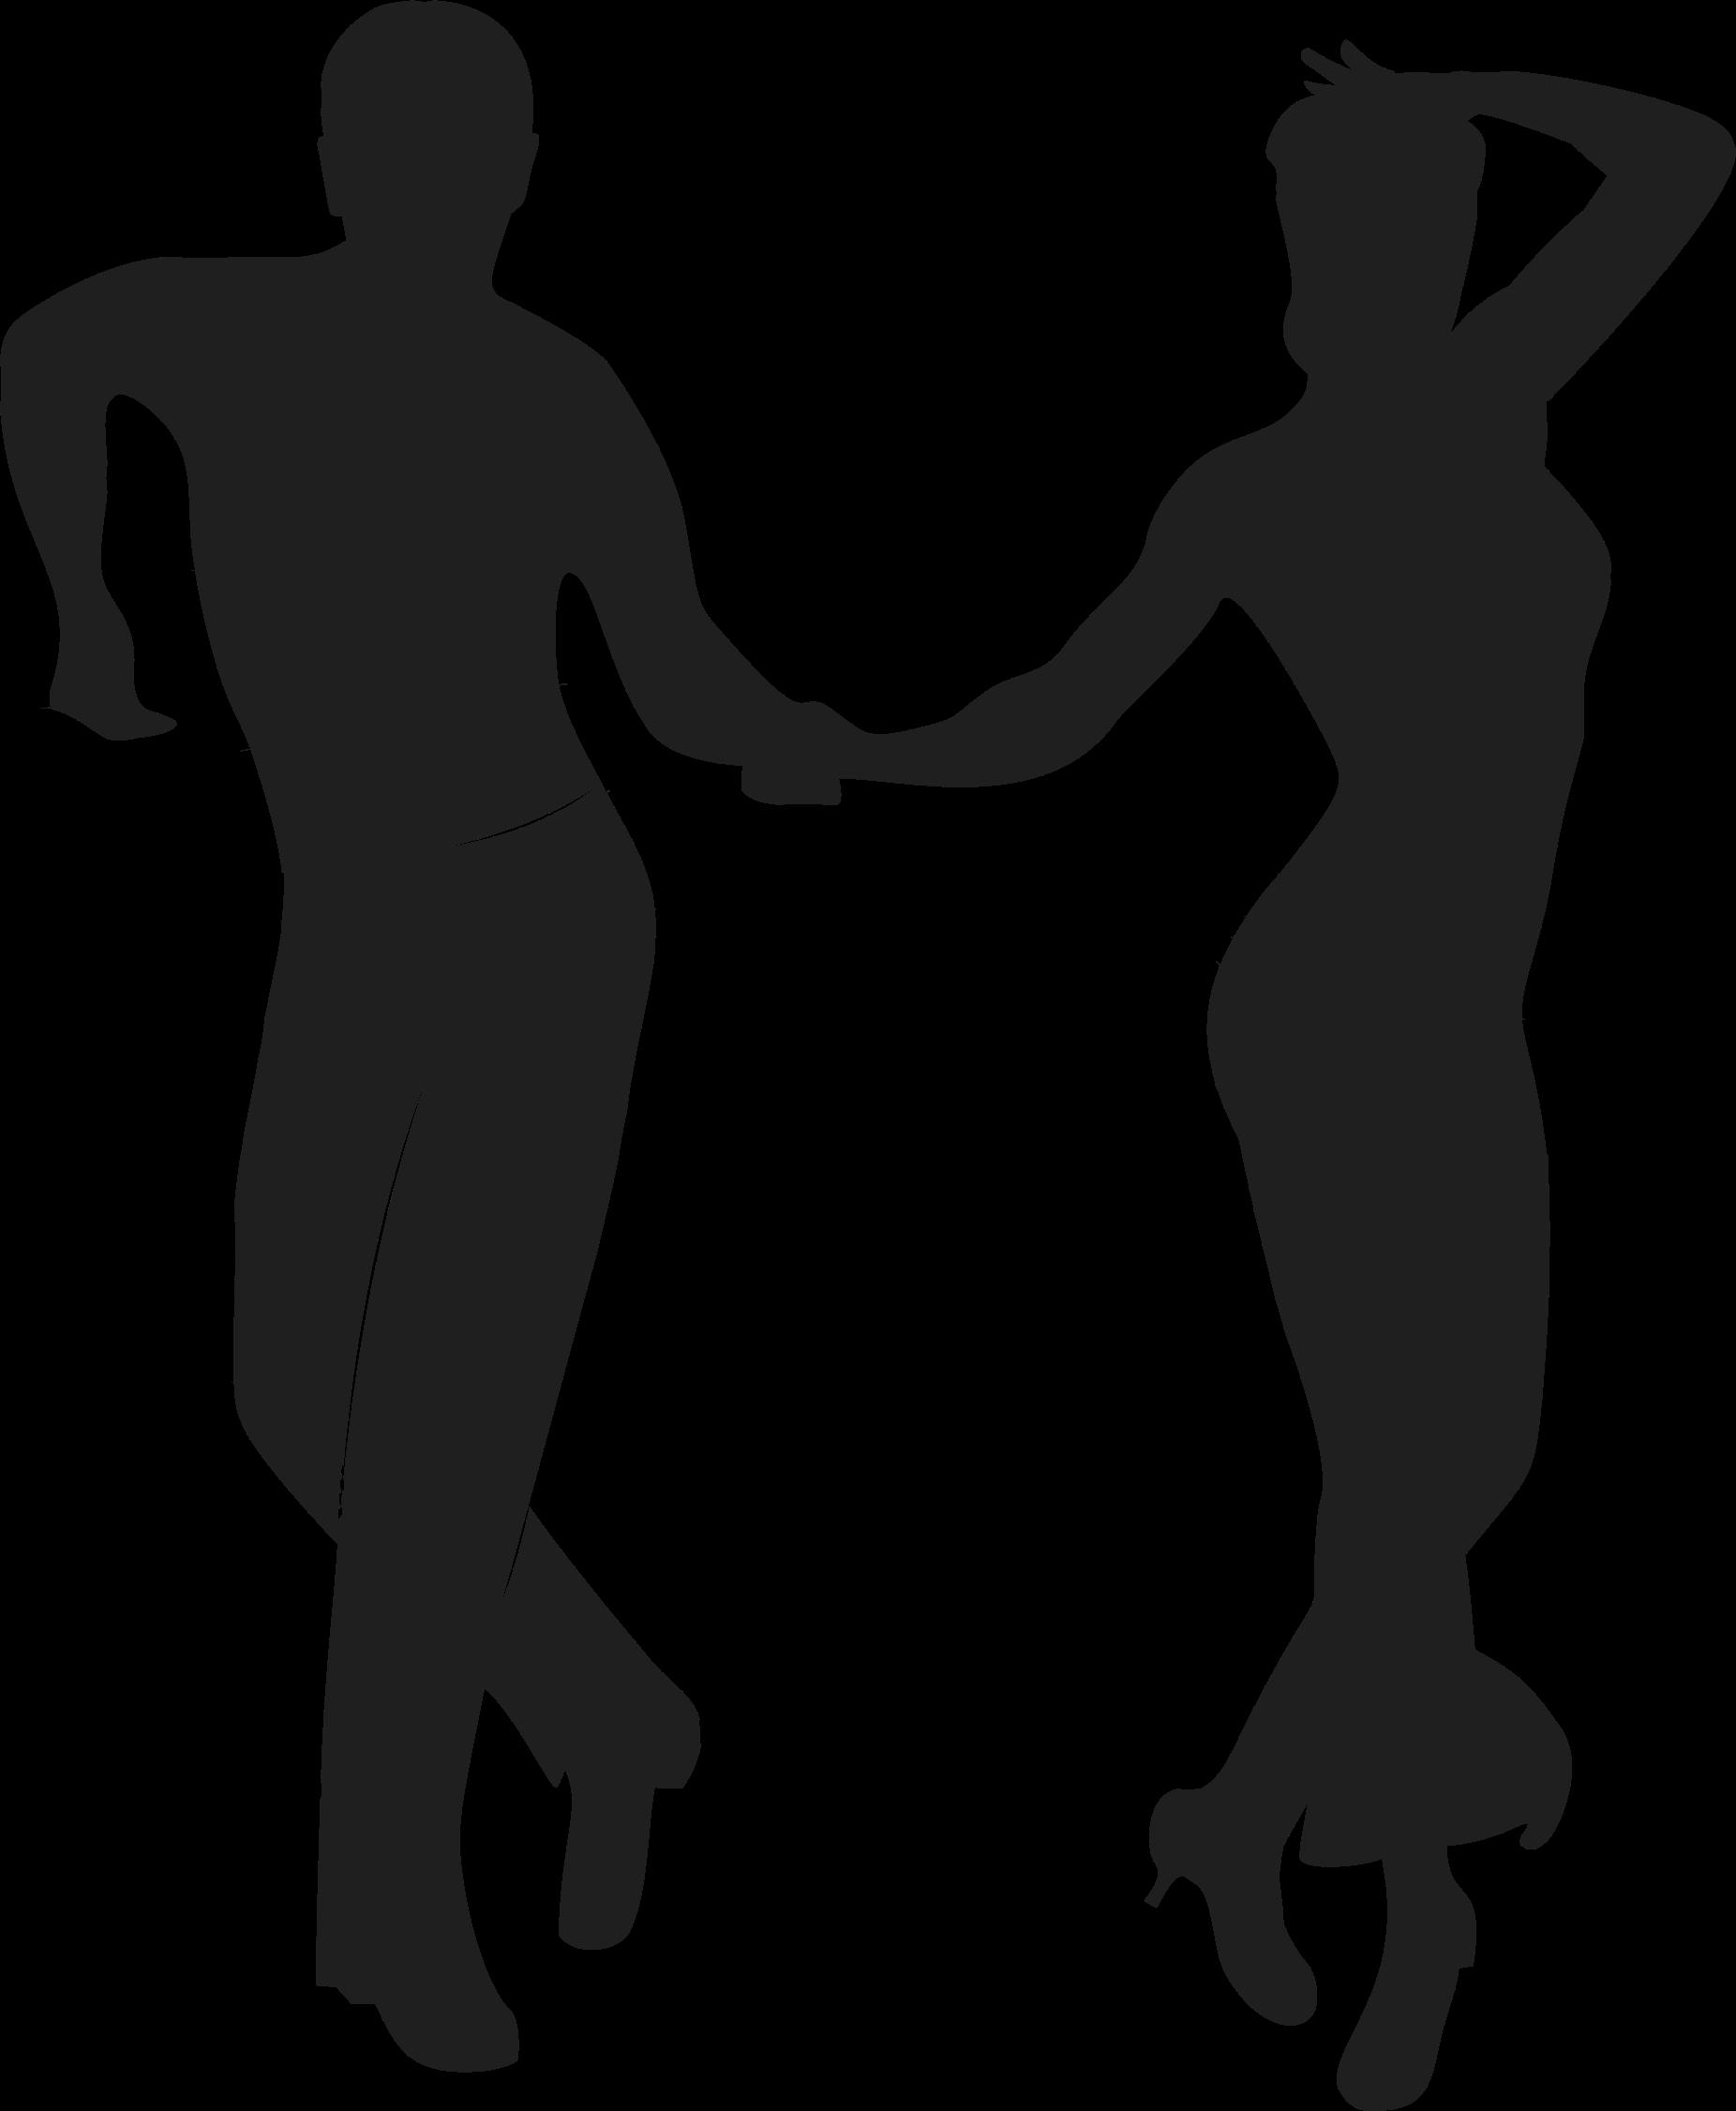 Dancers Modernsequencedancing Dancing Couple Silhouette Couple Silhouette Dance Silhouette